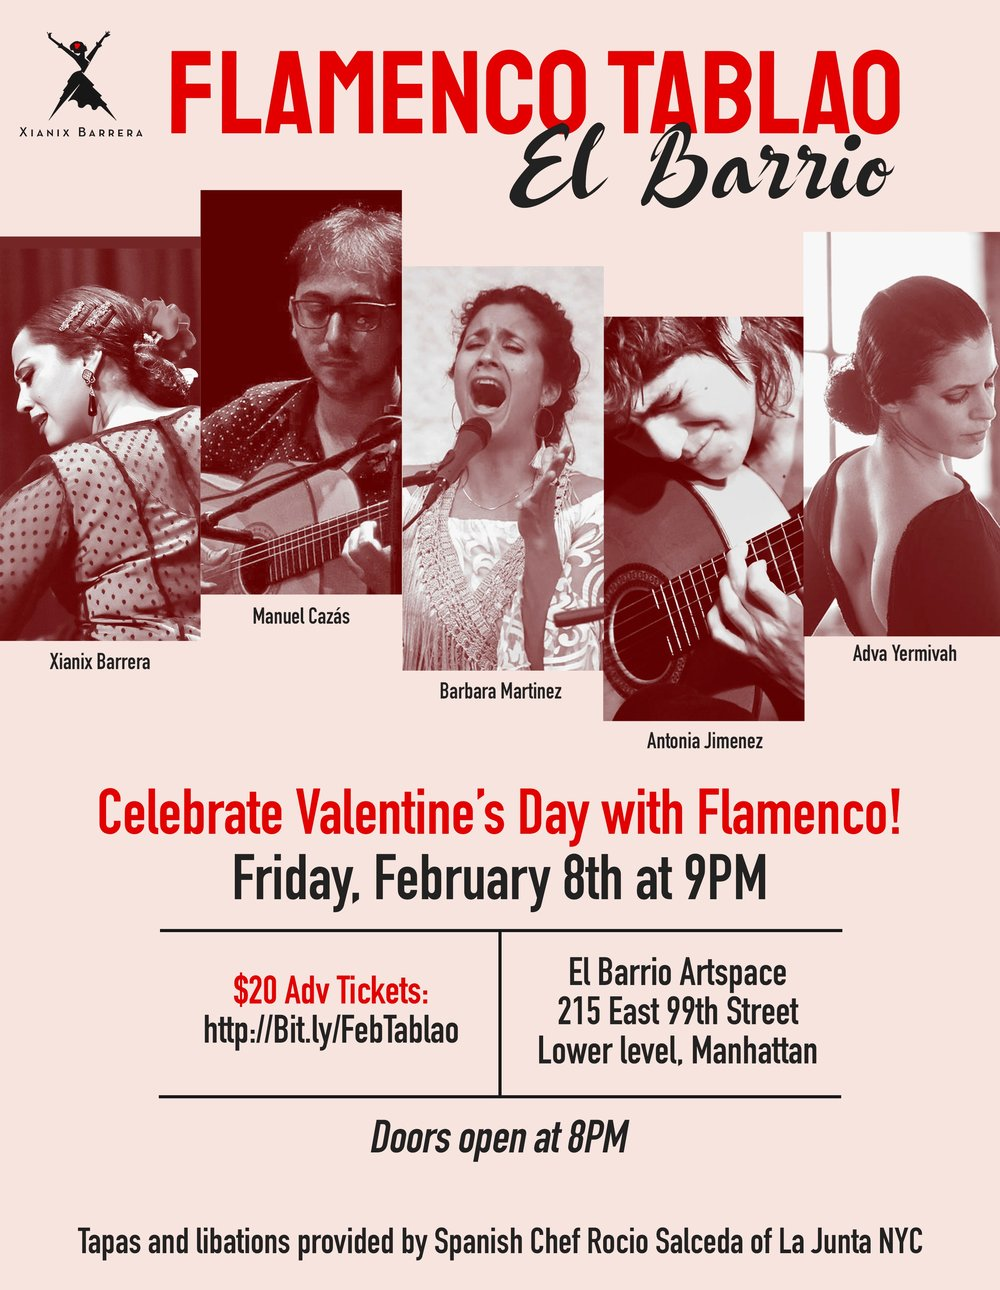 Fri. February 8, 2019 - 9pm - FLAMENCO TABLAOFeaturing Guest Artists Antonia Jimenez, Manuel Cazás and Adva Yermivahwith Barbara Martinez and Xianix Barrera.